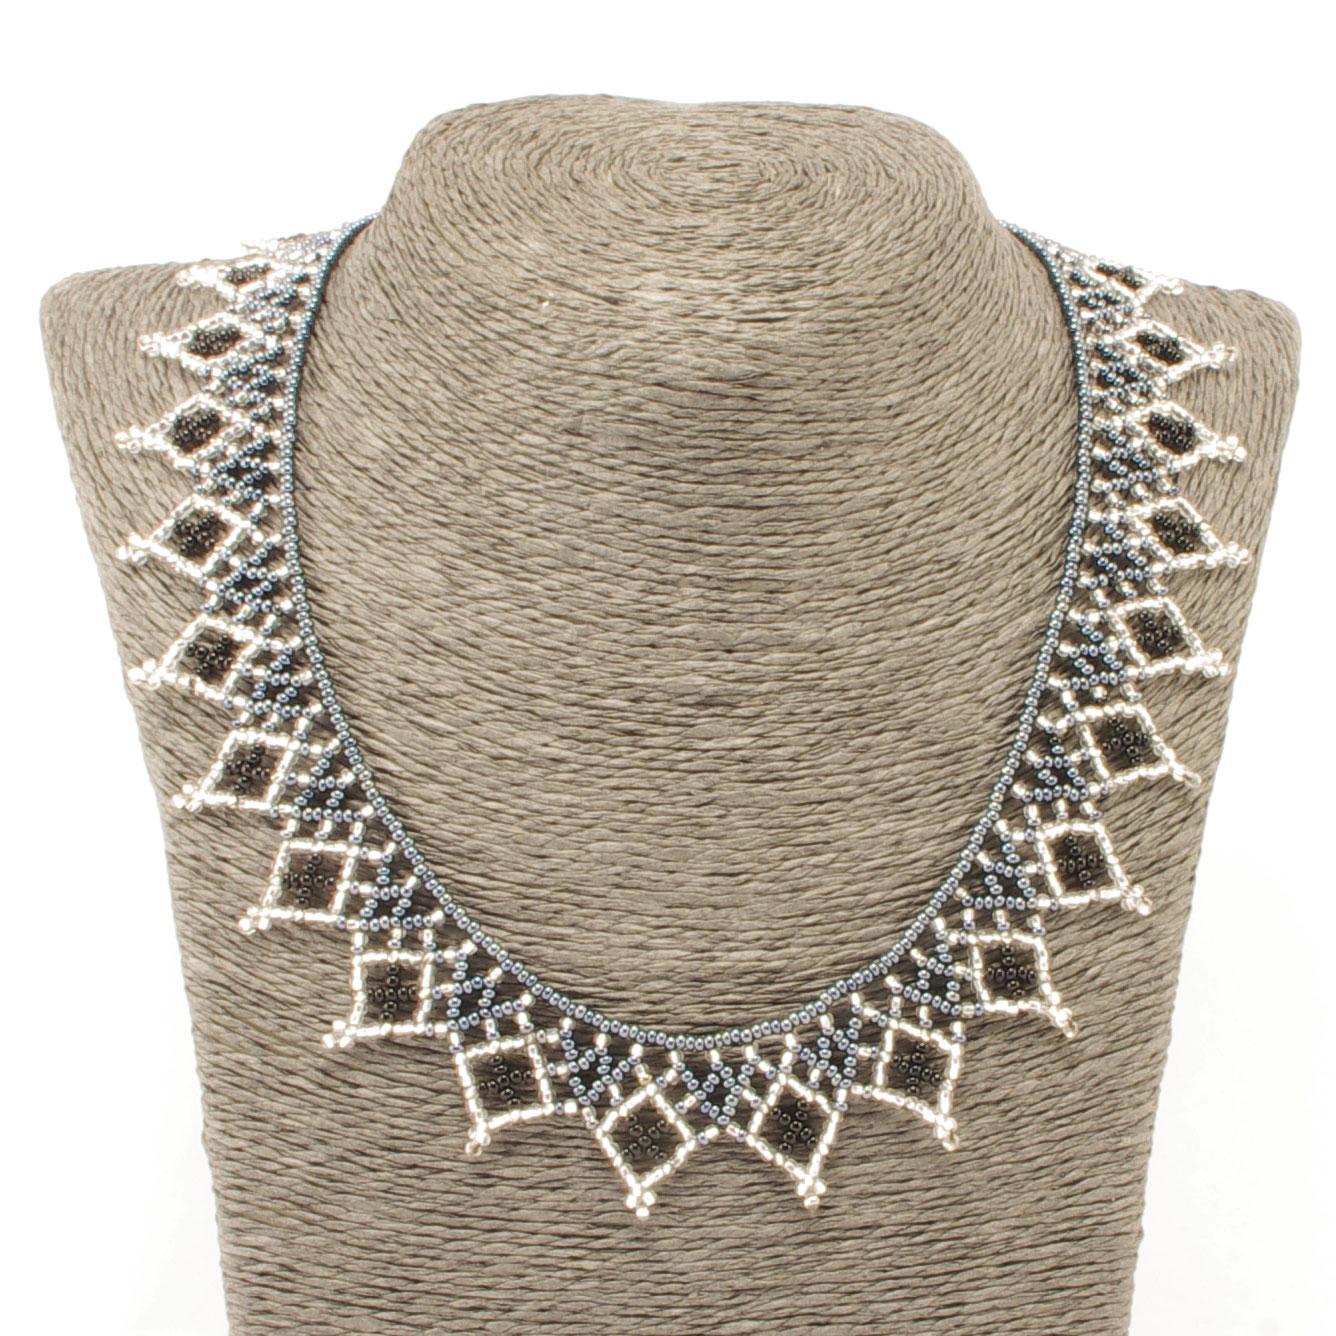 Fair Trade Guatemalan Beaded Volcano Necklace Gray